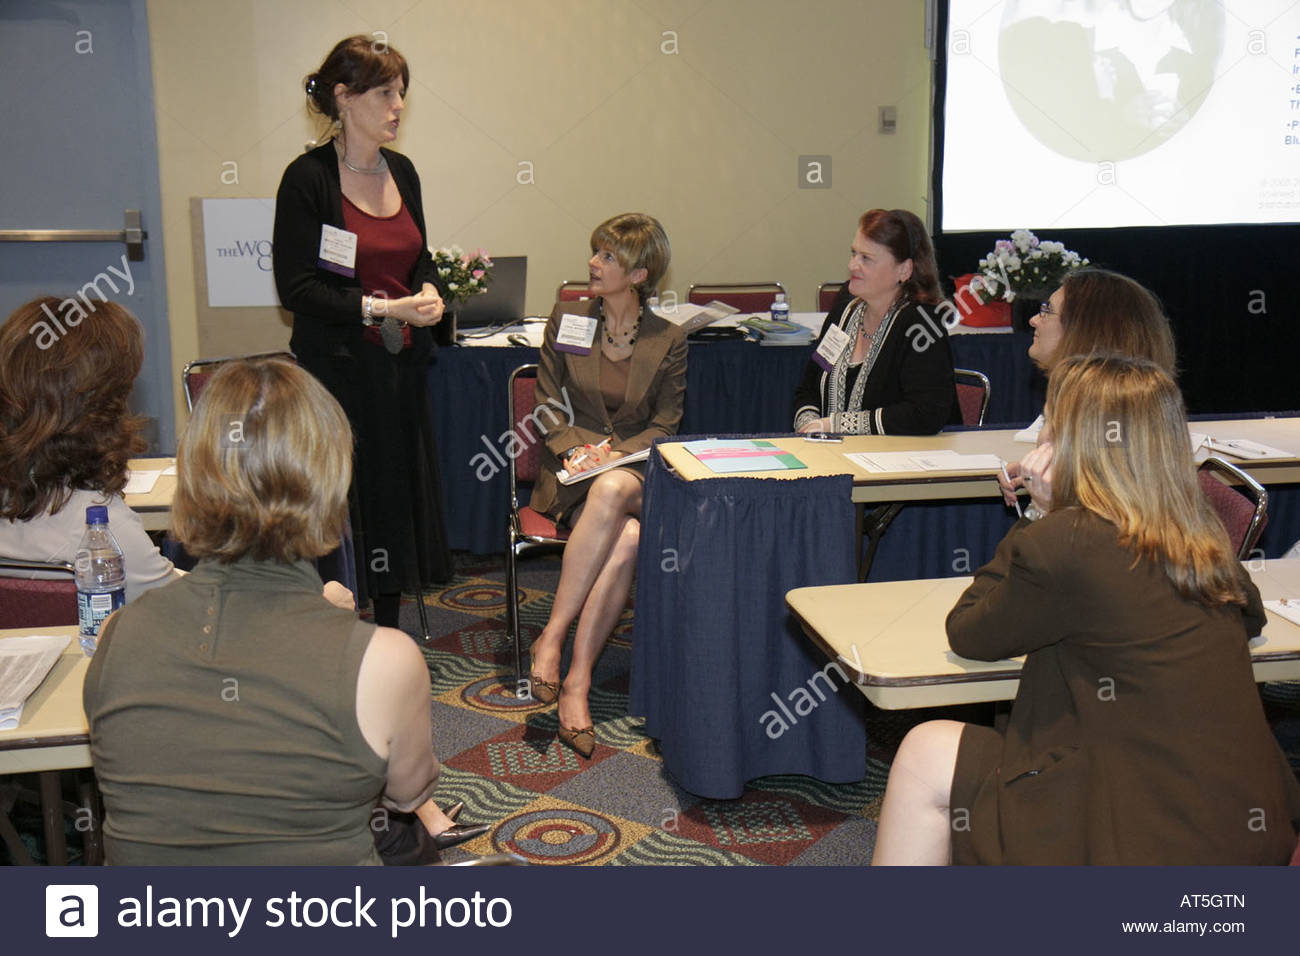 women s congress business career networking w speaker stock stock photo women s congress business career networking w speaker